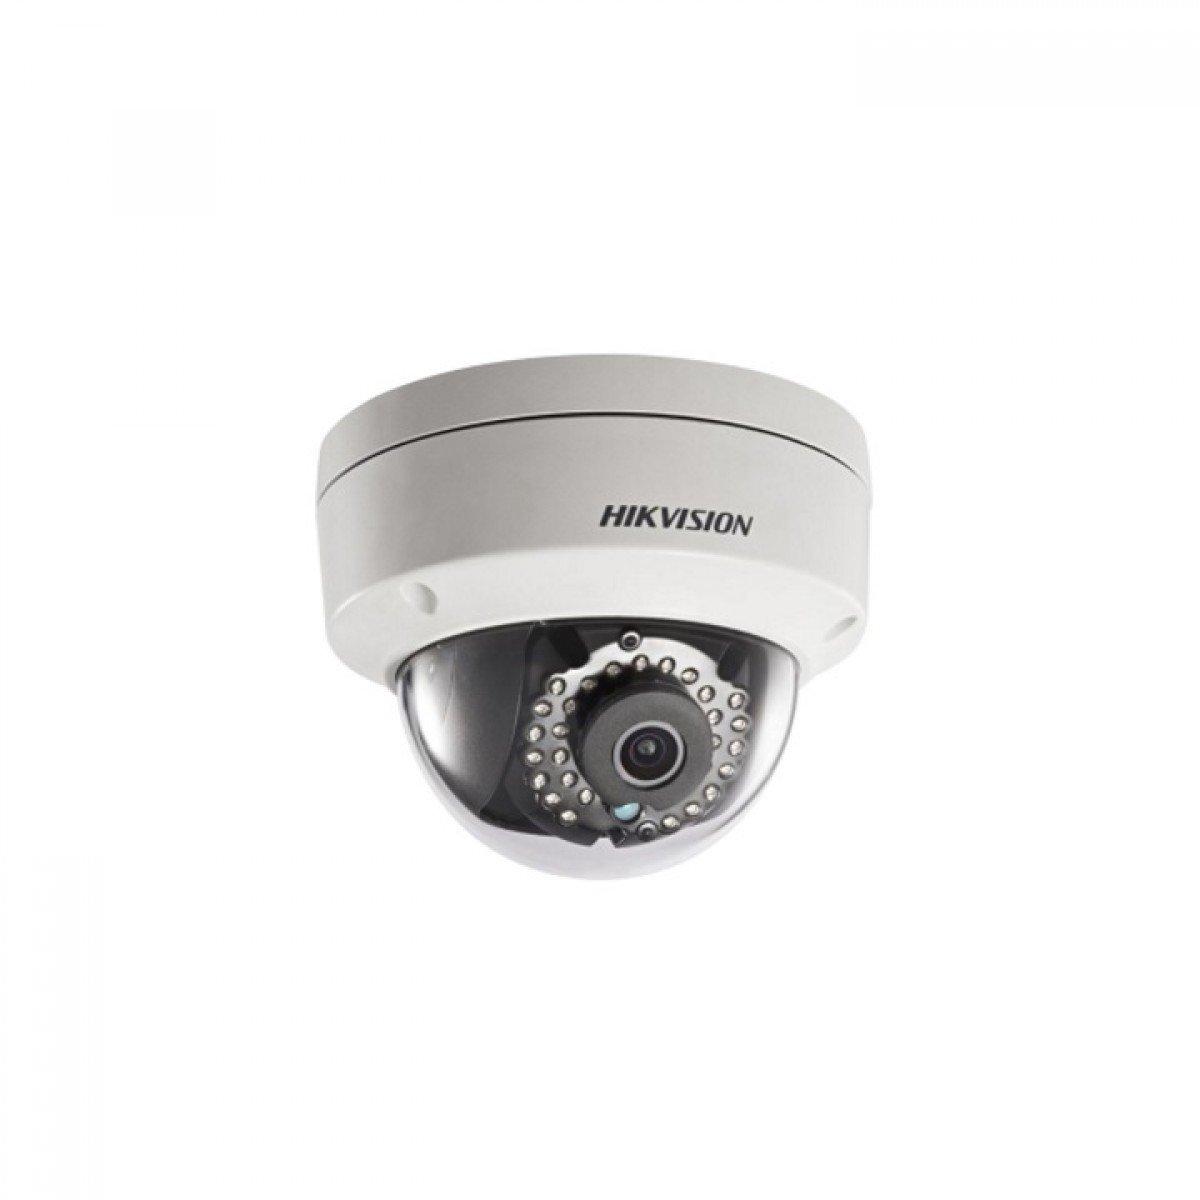 Hikvision USA 3 Megapixel Network Camera – Color DS-2CD2132F-IWS